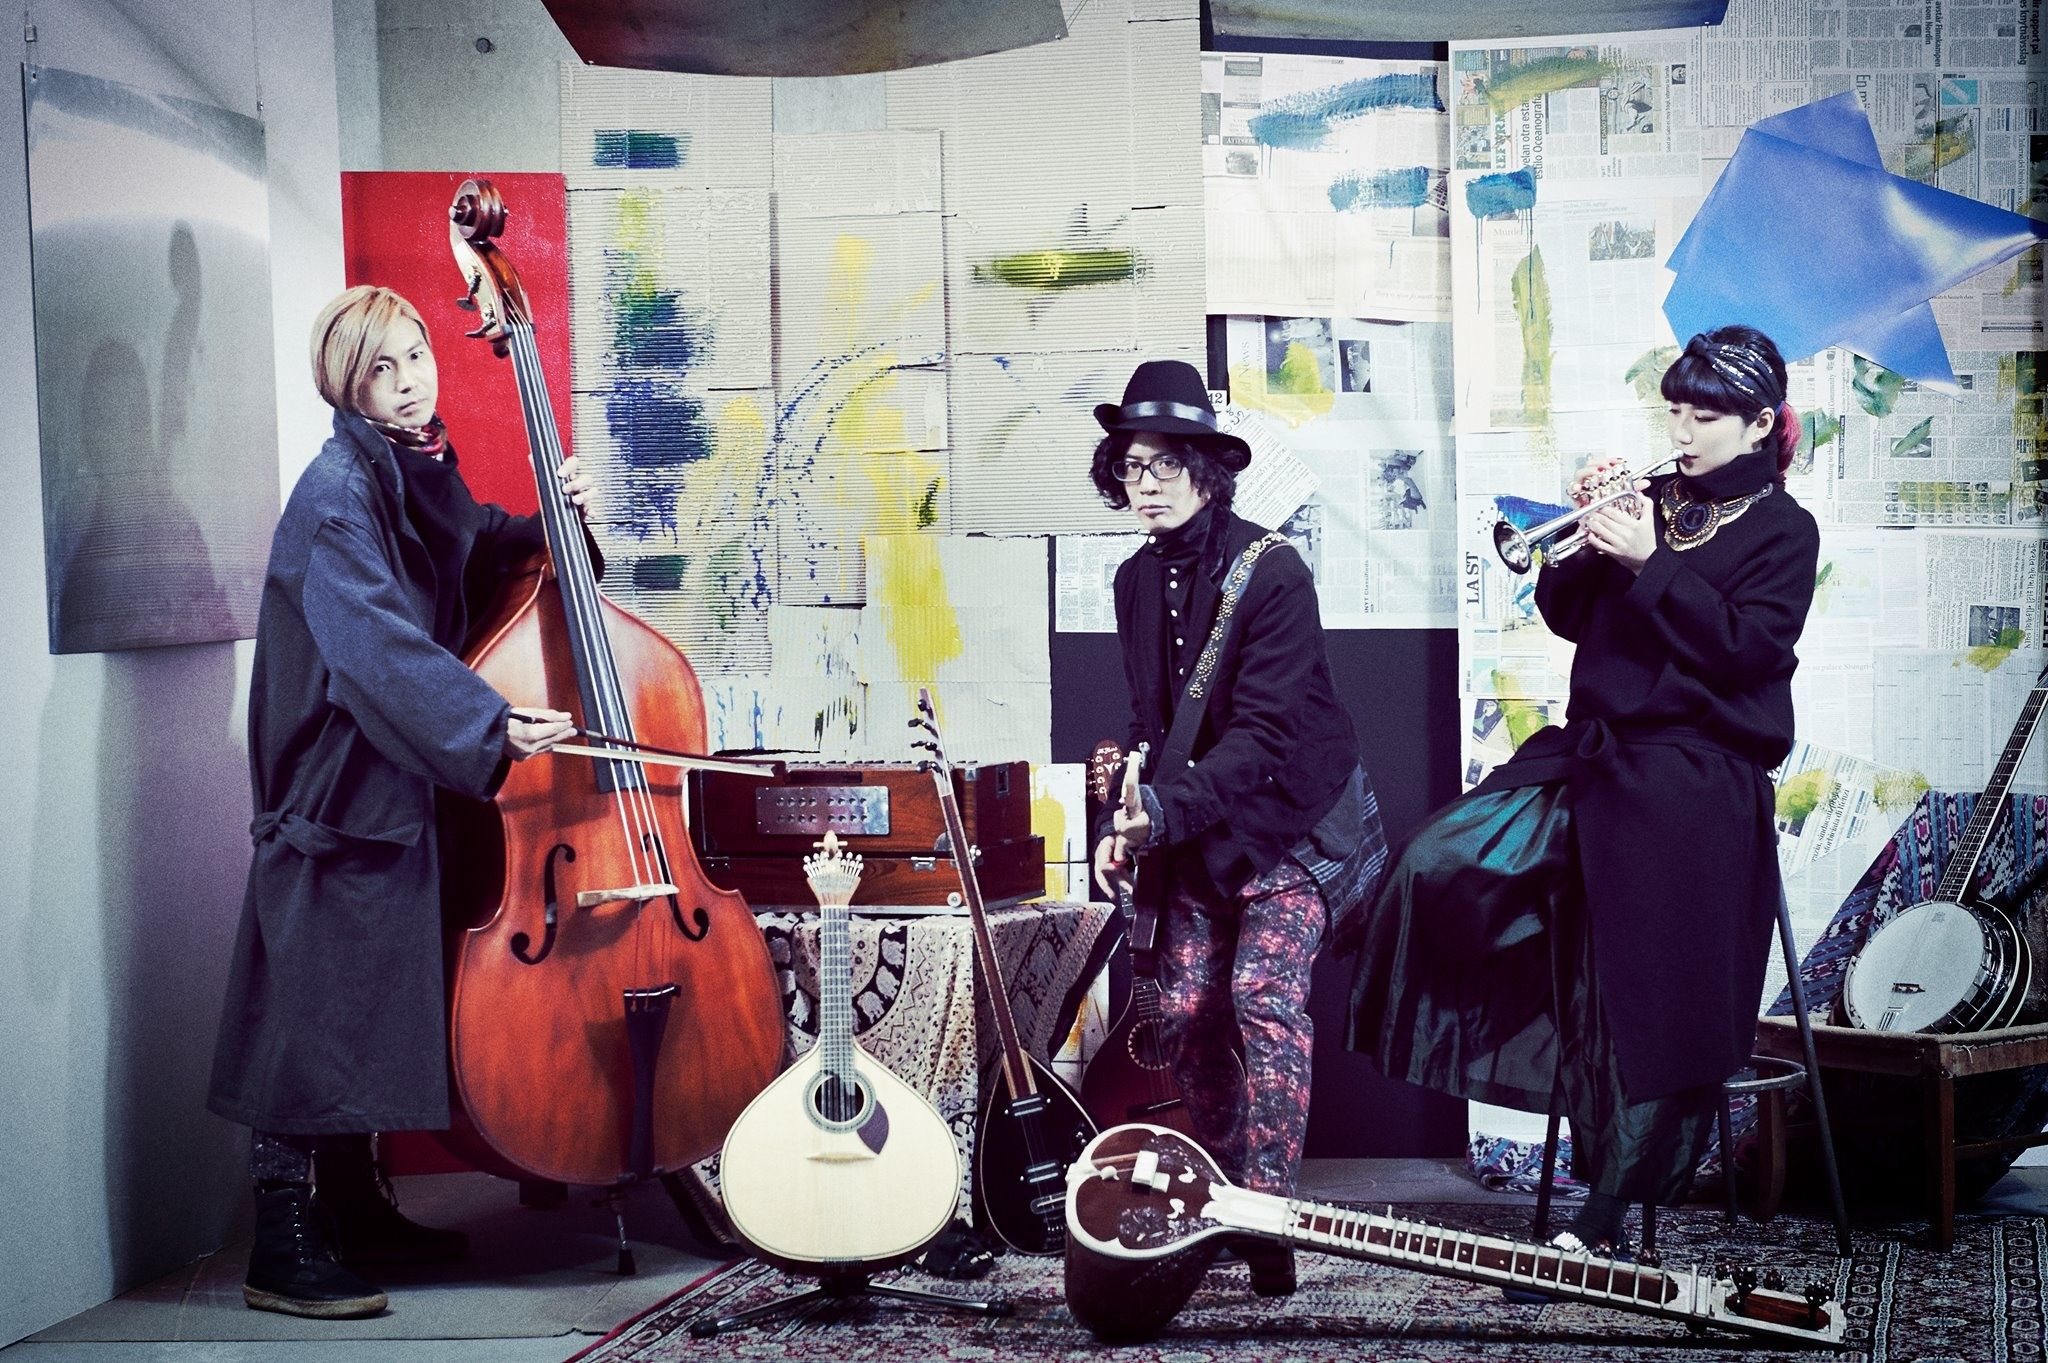 Band Music Quruli Dapat Merubah Pandangan Remaja Jepang